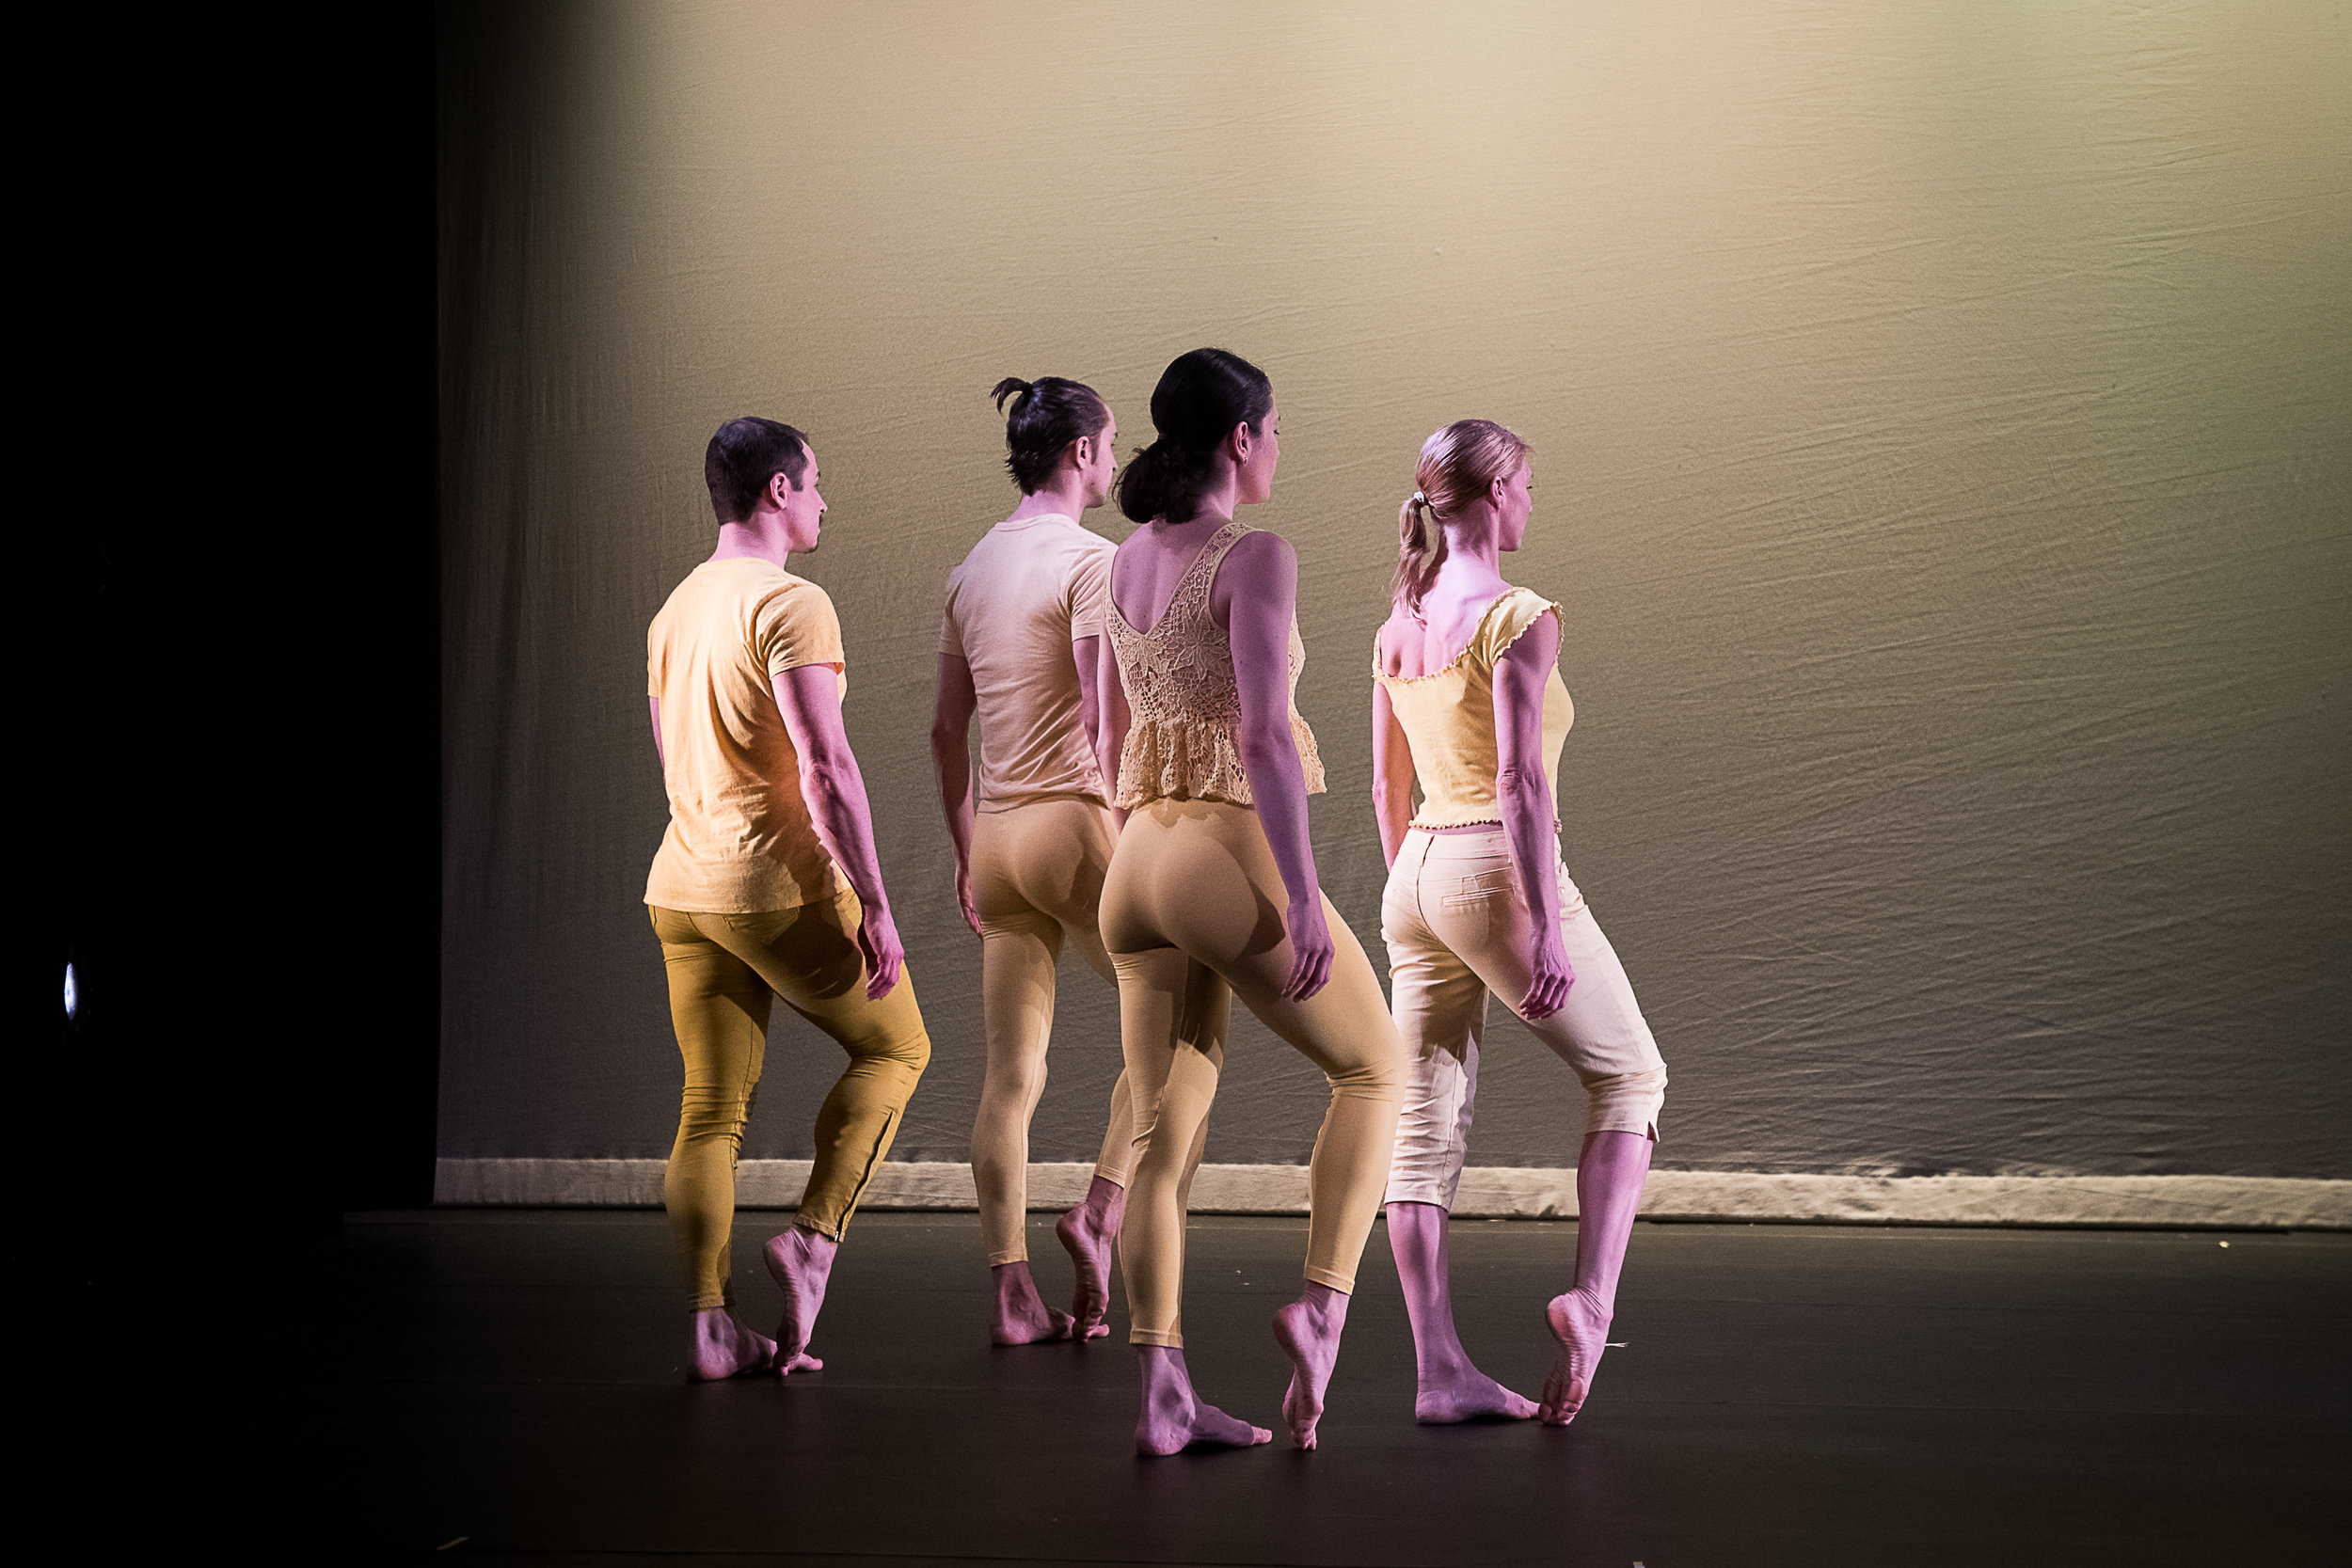 Dancers Left to Right: Jake Szczypek, Timothy Ward, Alexandra Berger, Emily Pope. Photo by Christopher Duggan, 2018